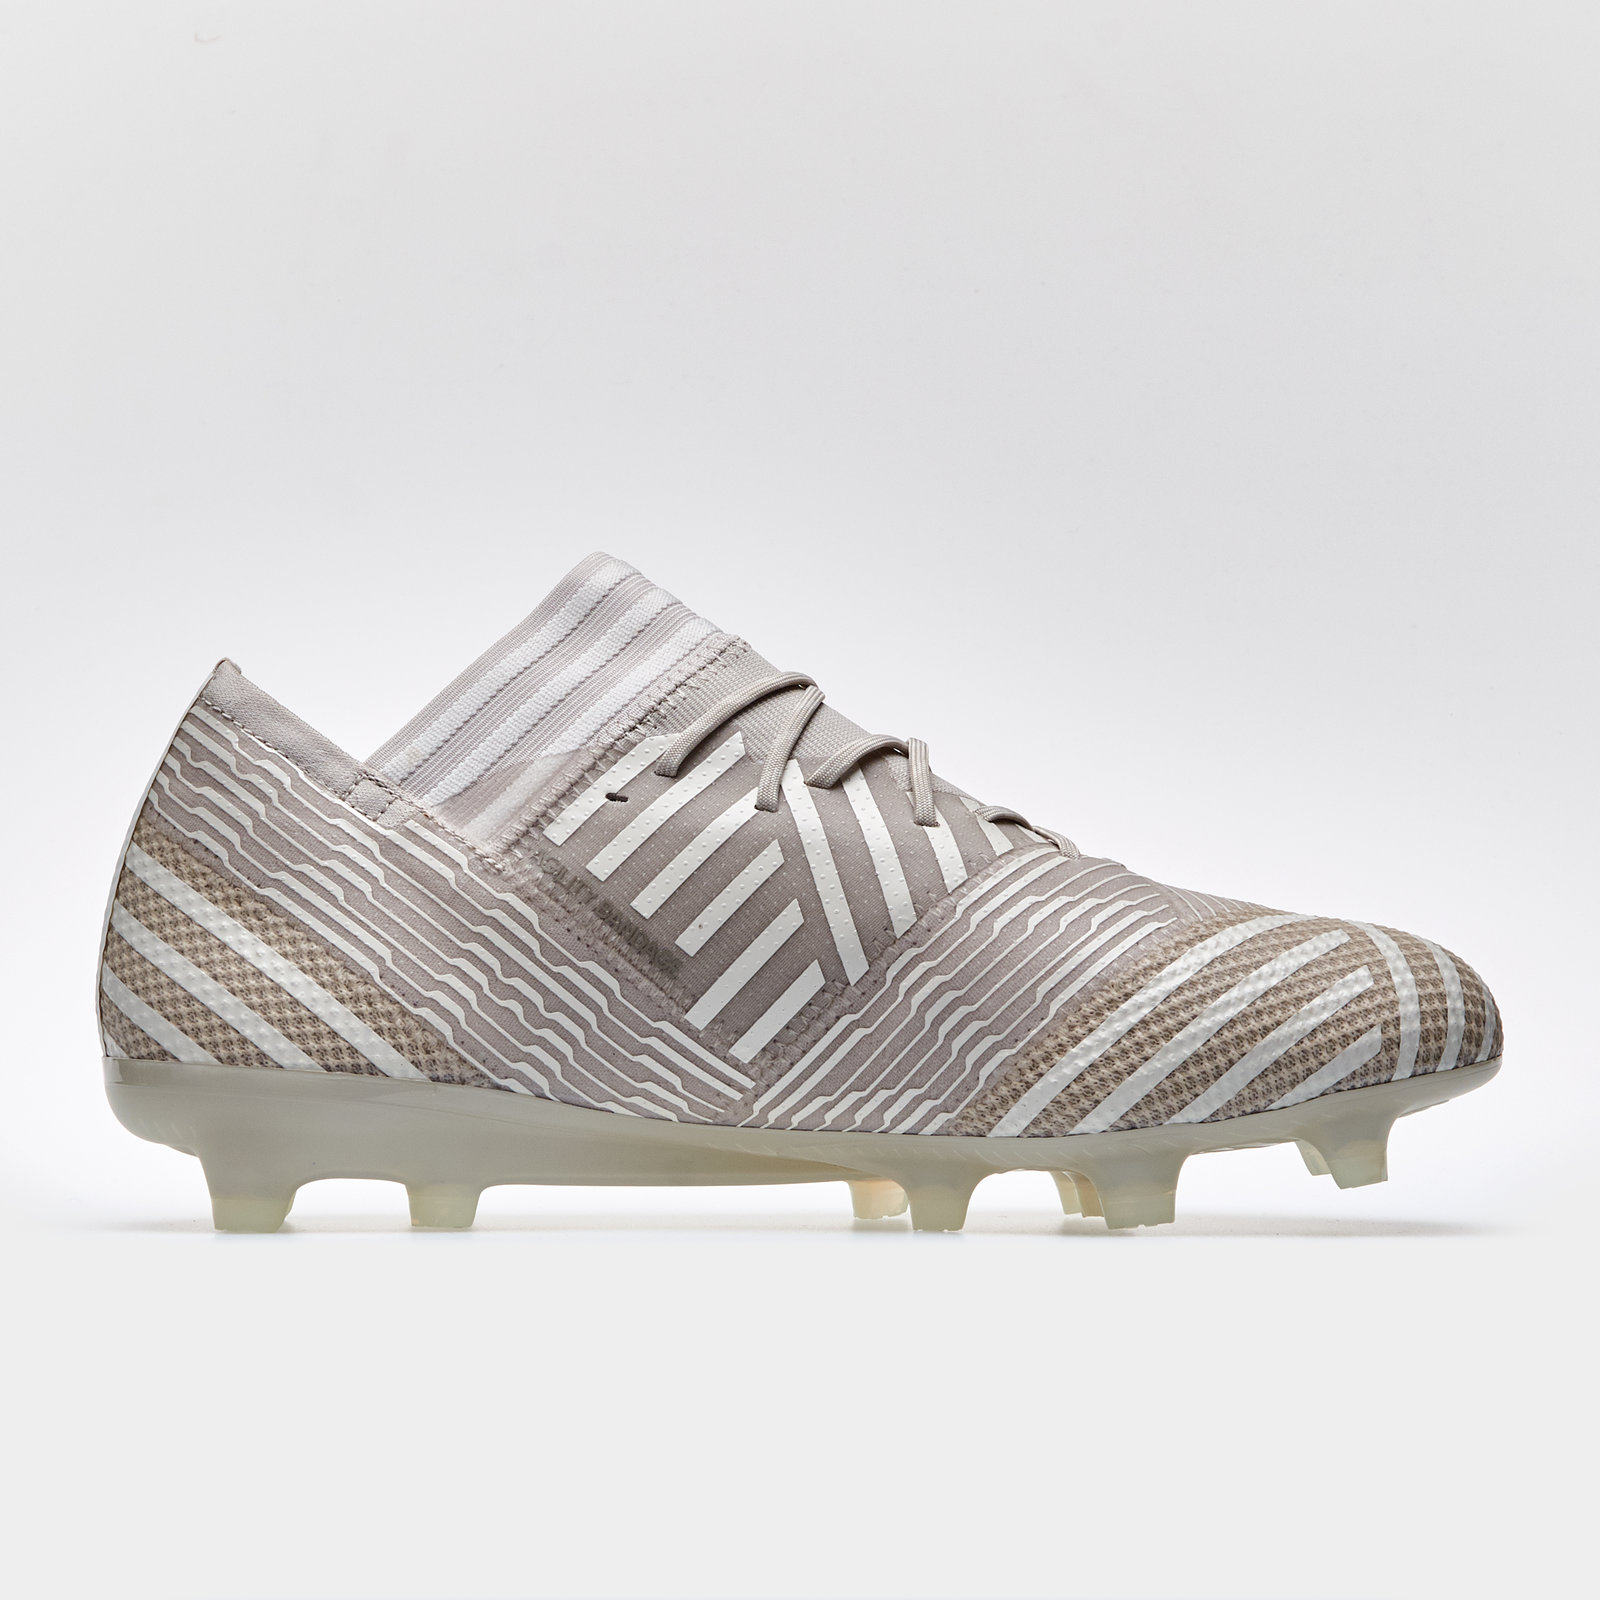 c1eef6aee adidas Nemeziz 17.1 FG Football Boots